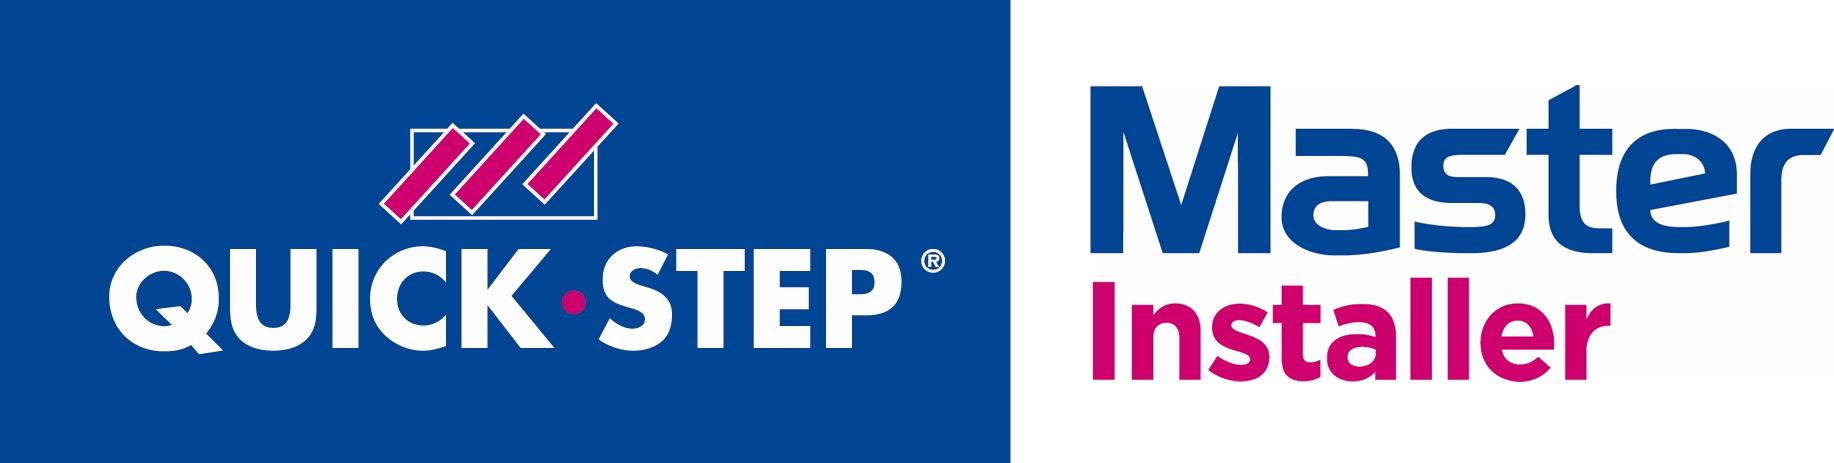 quickstep-logo-master